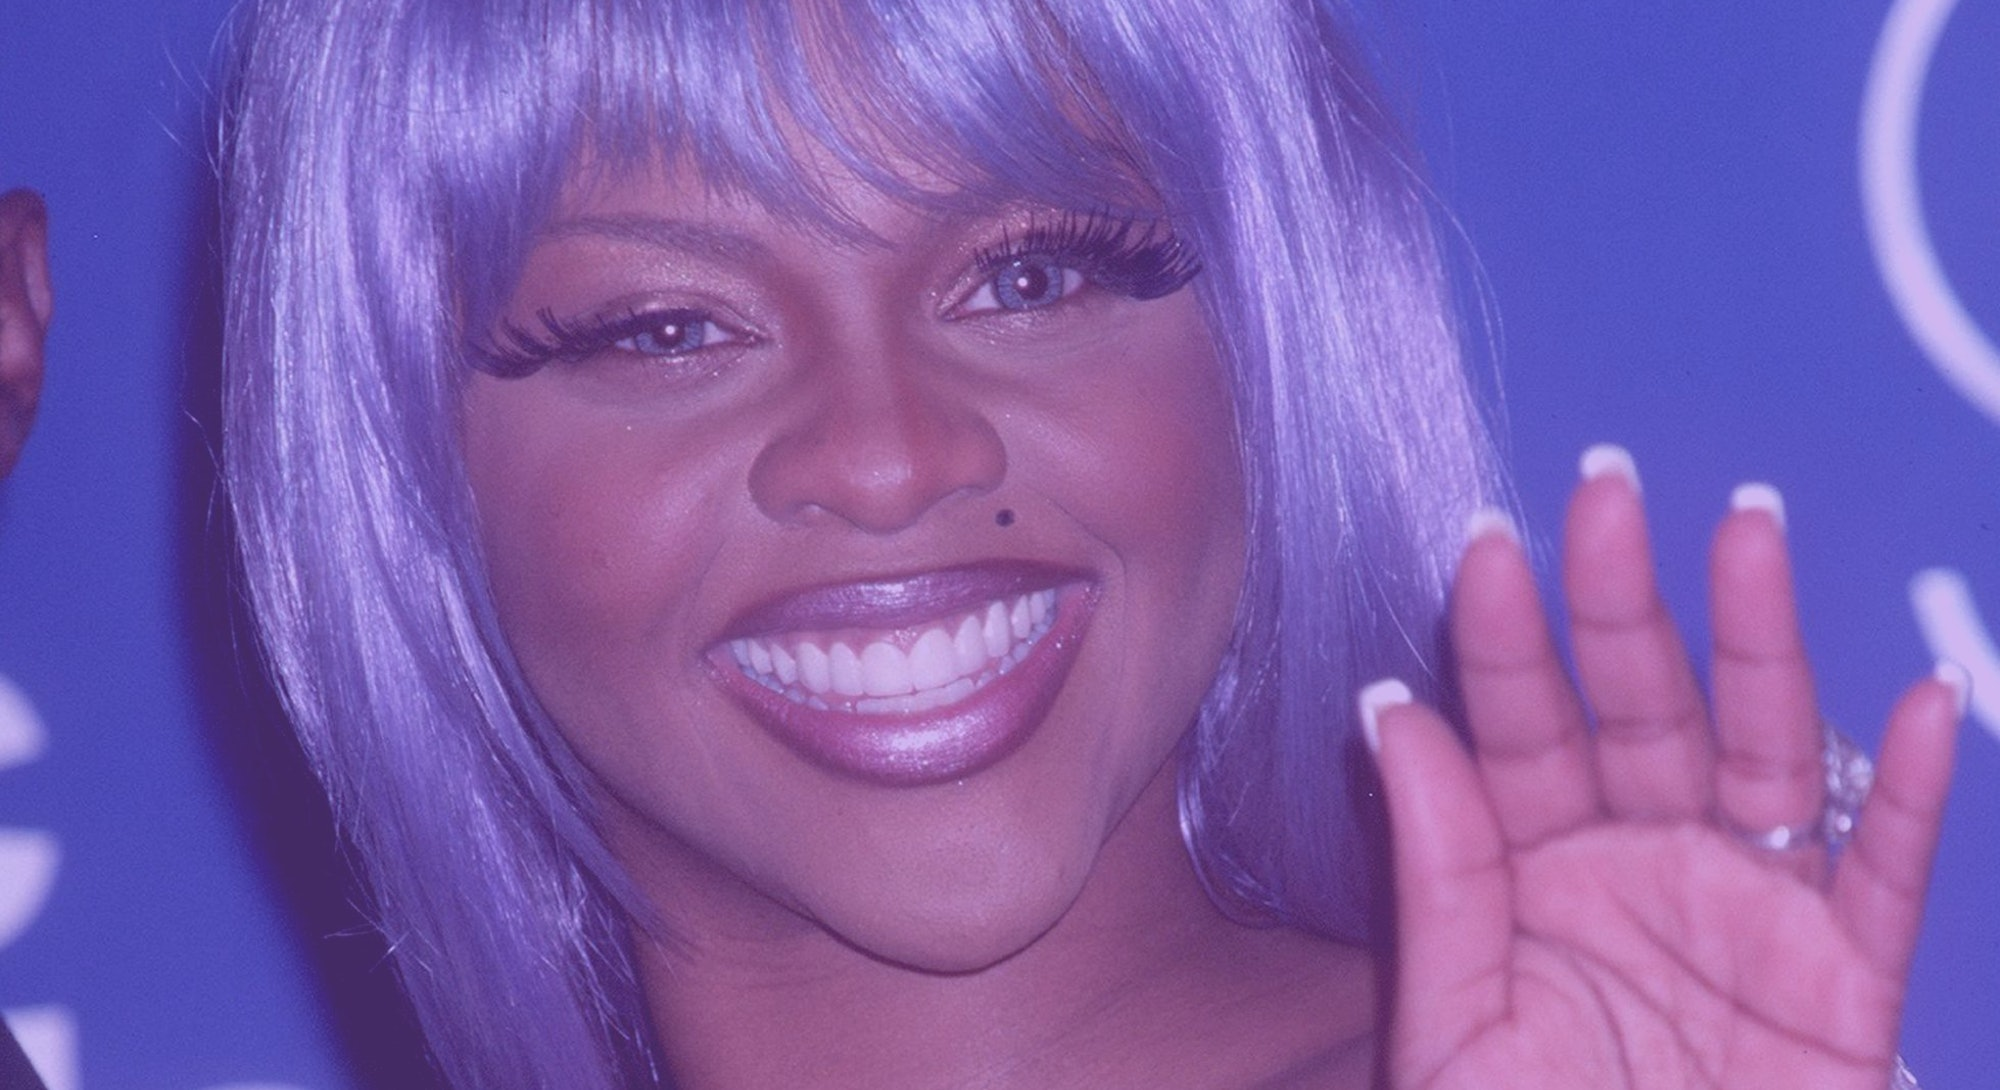 371945 02: FILE PHOTO: Rap Artist Lil'' Kim attends the 1999 MTV Video Music Awards September 9, 199...